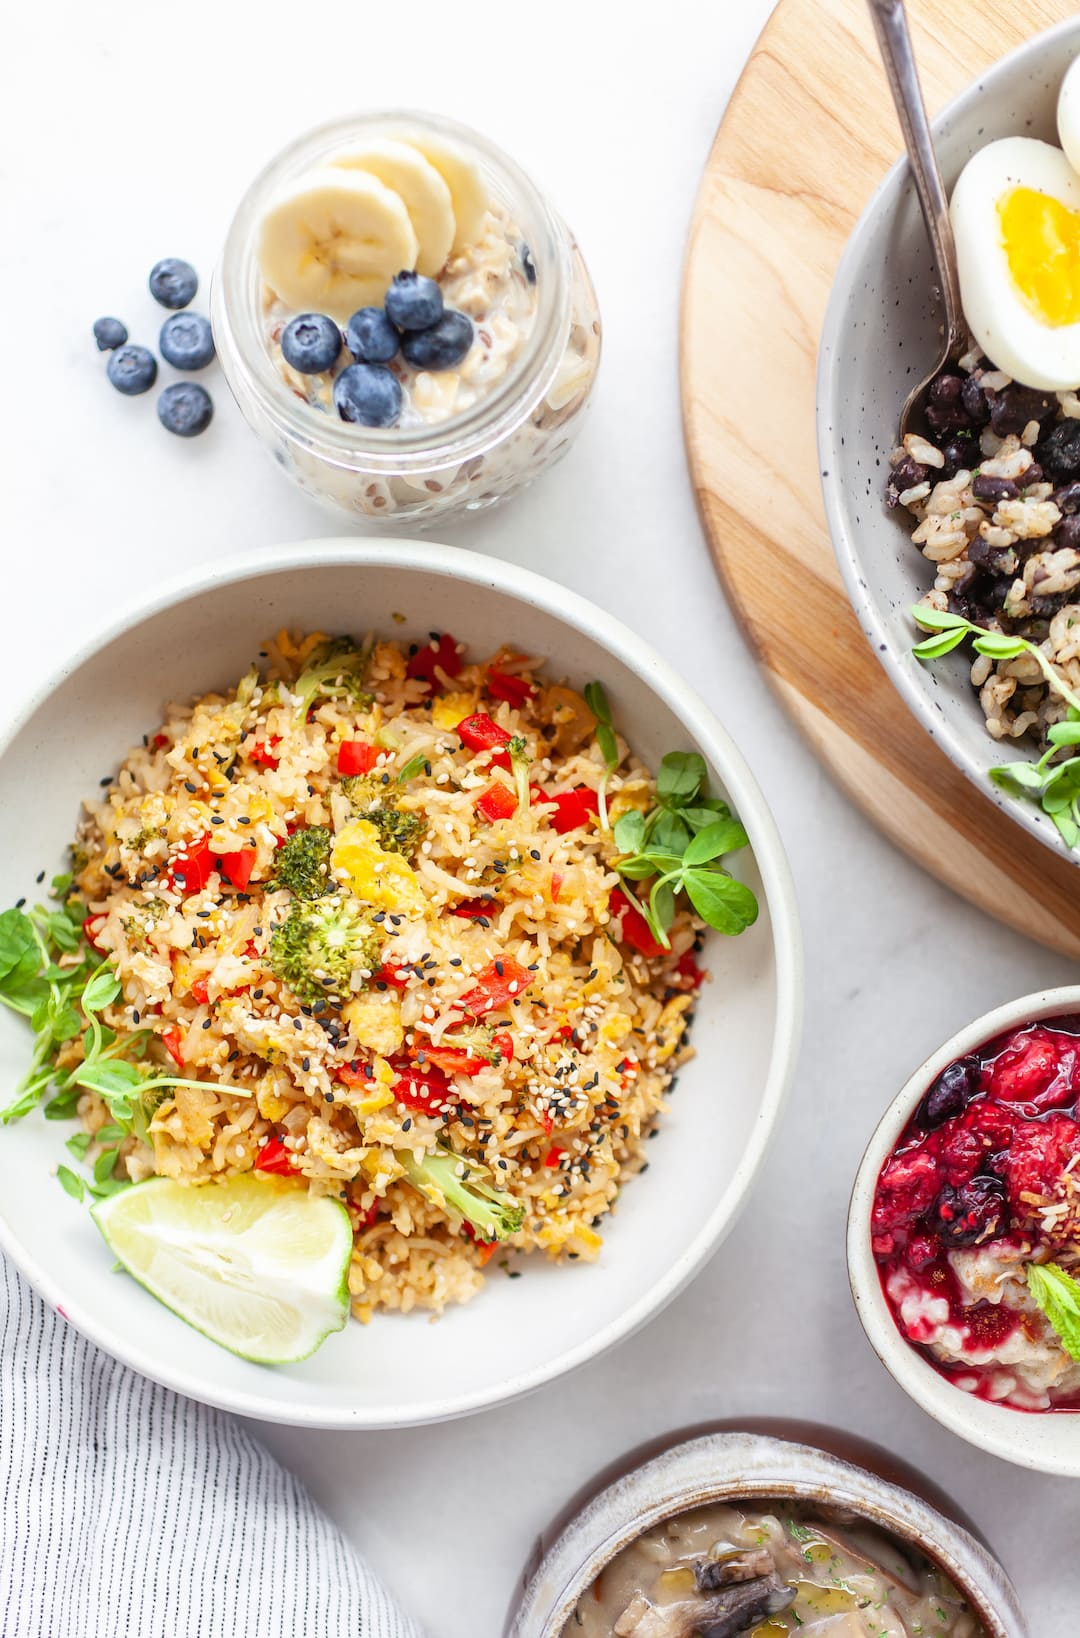 5 Simple & Tasty Rice Recipe Ideas - Fried Rice, Rice Pudding,